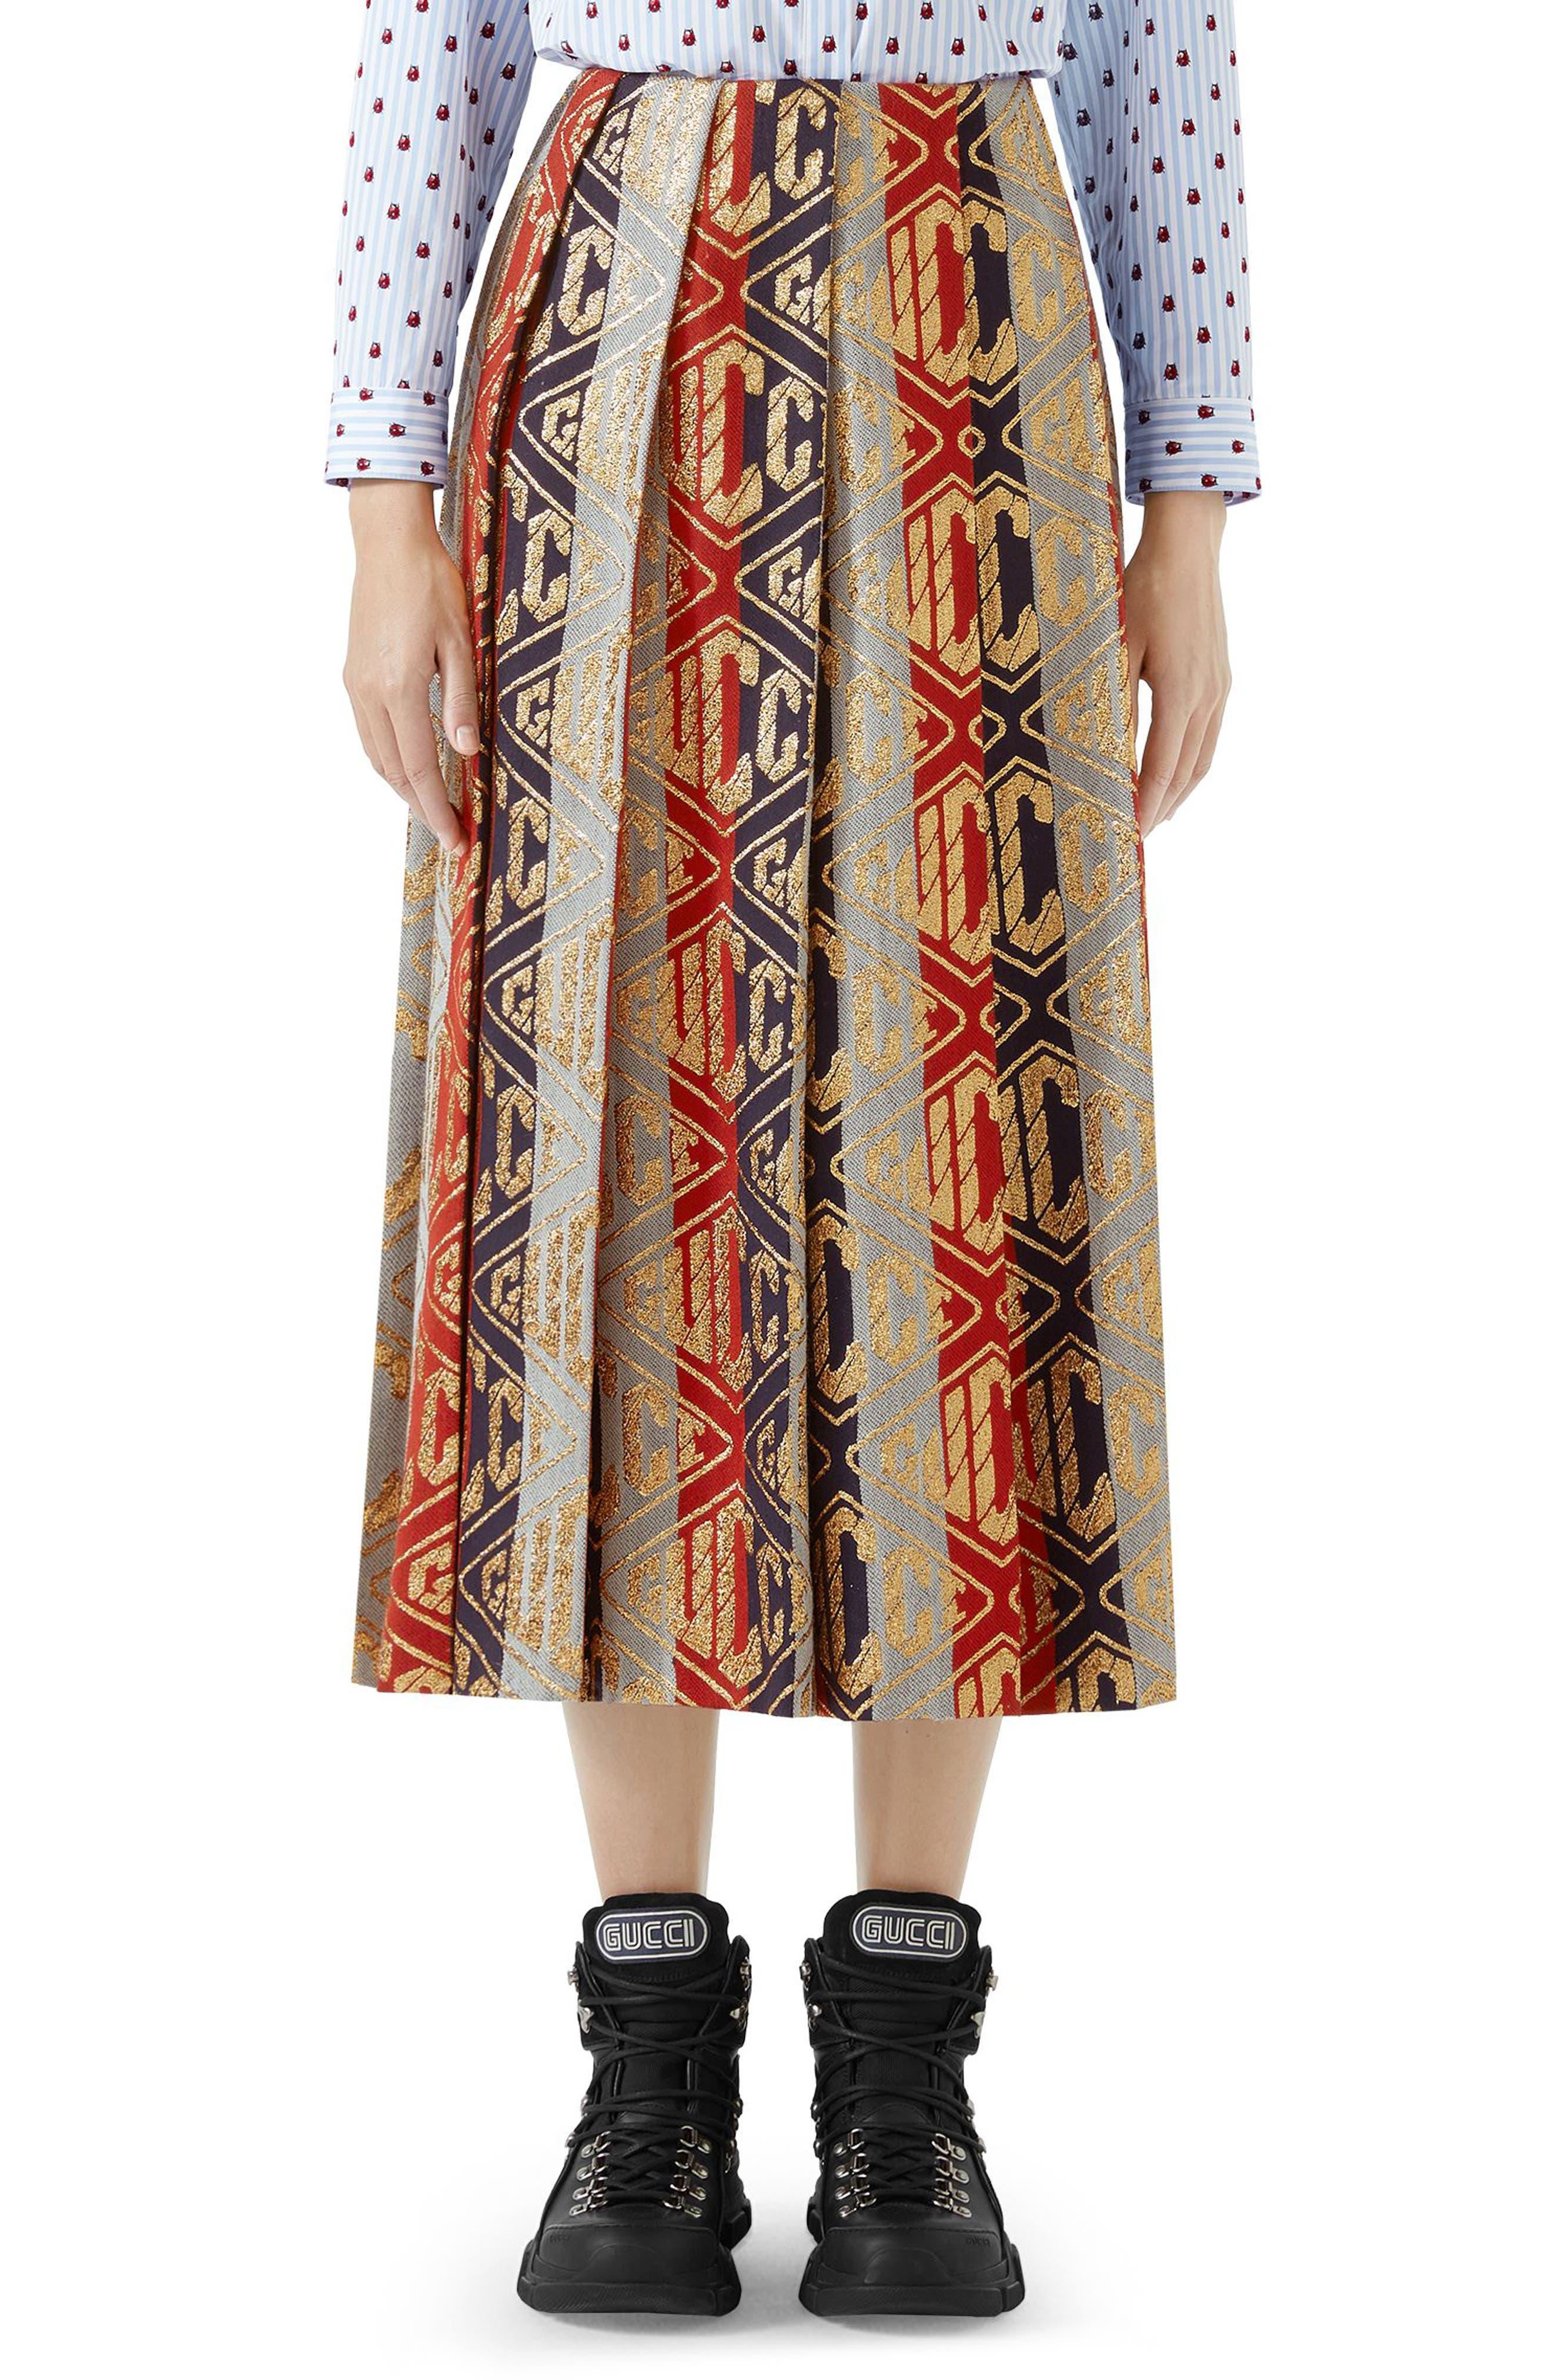 GUCCI Metallic Logo Pleated Wool Blend Skirt, Main, color, SYLVIE LUREX